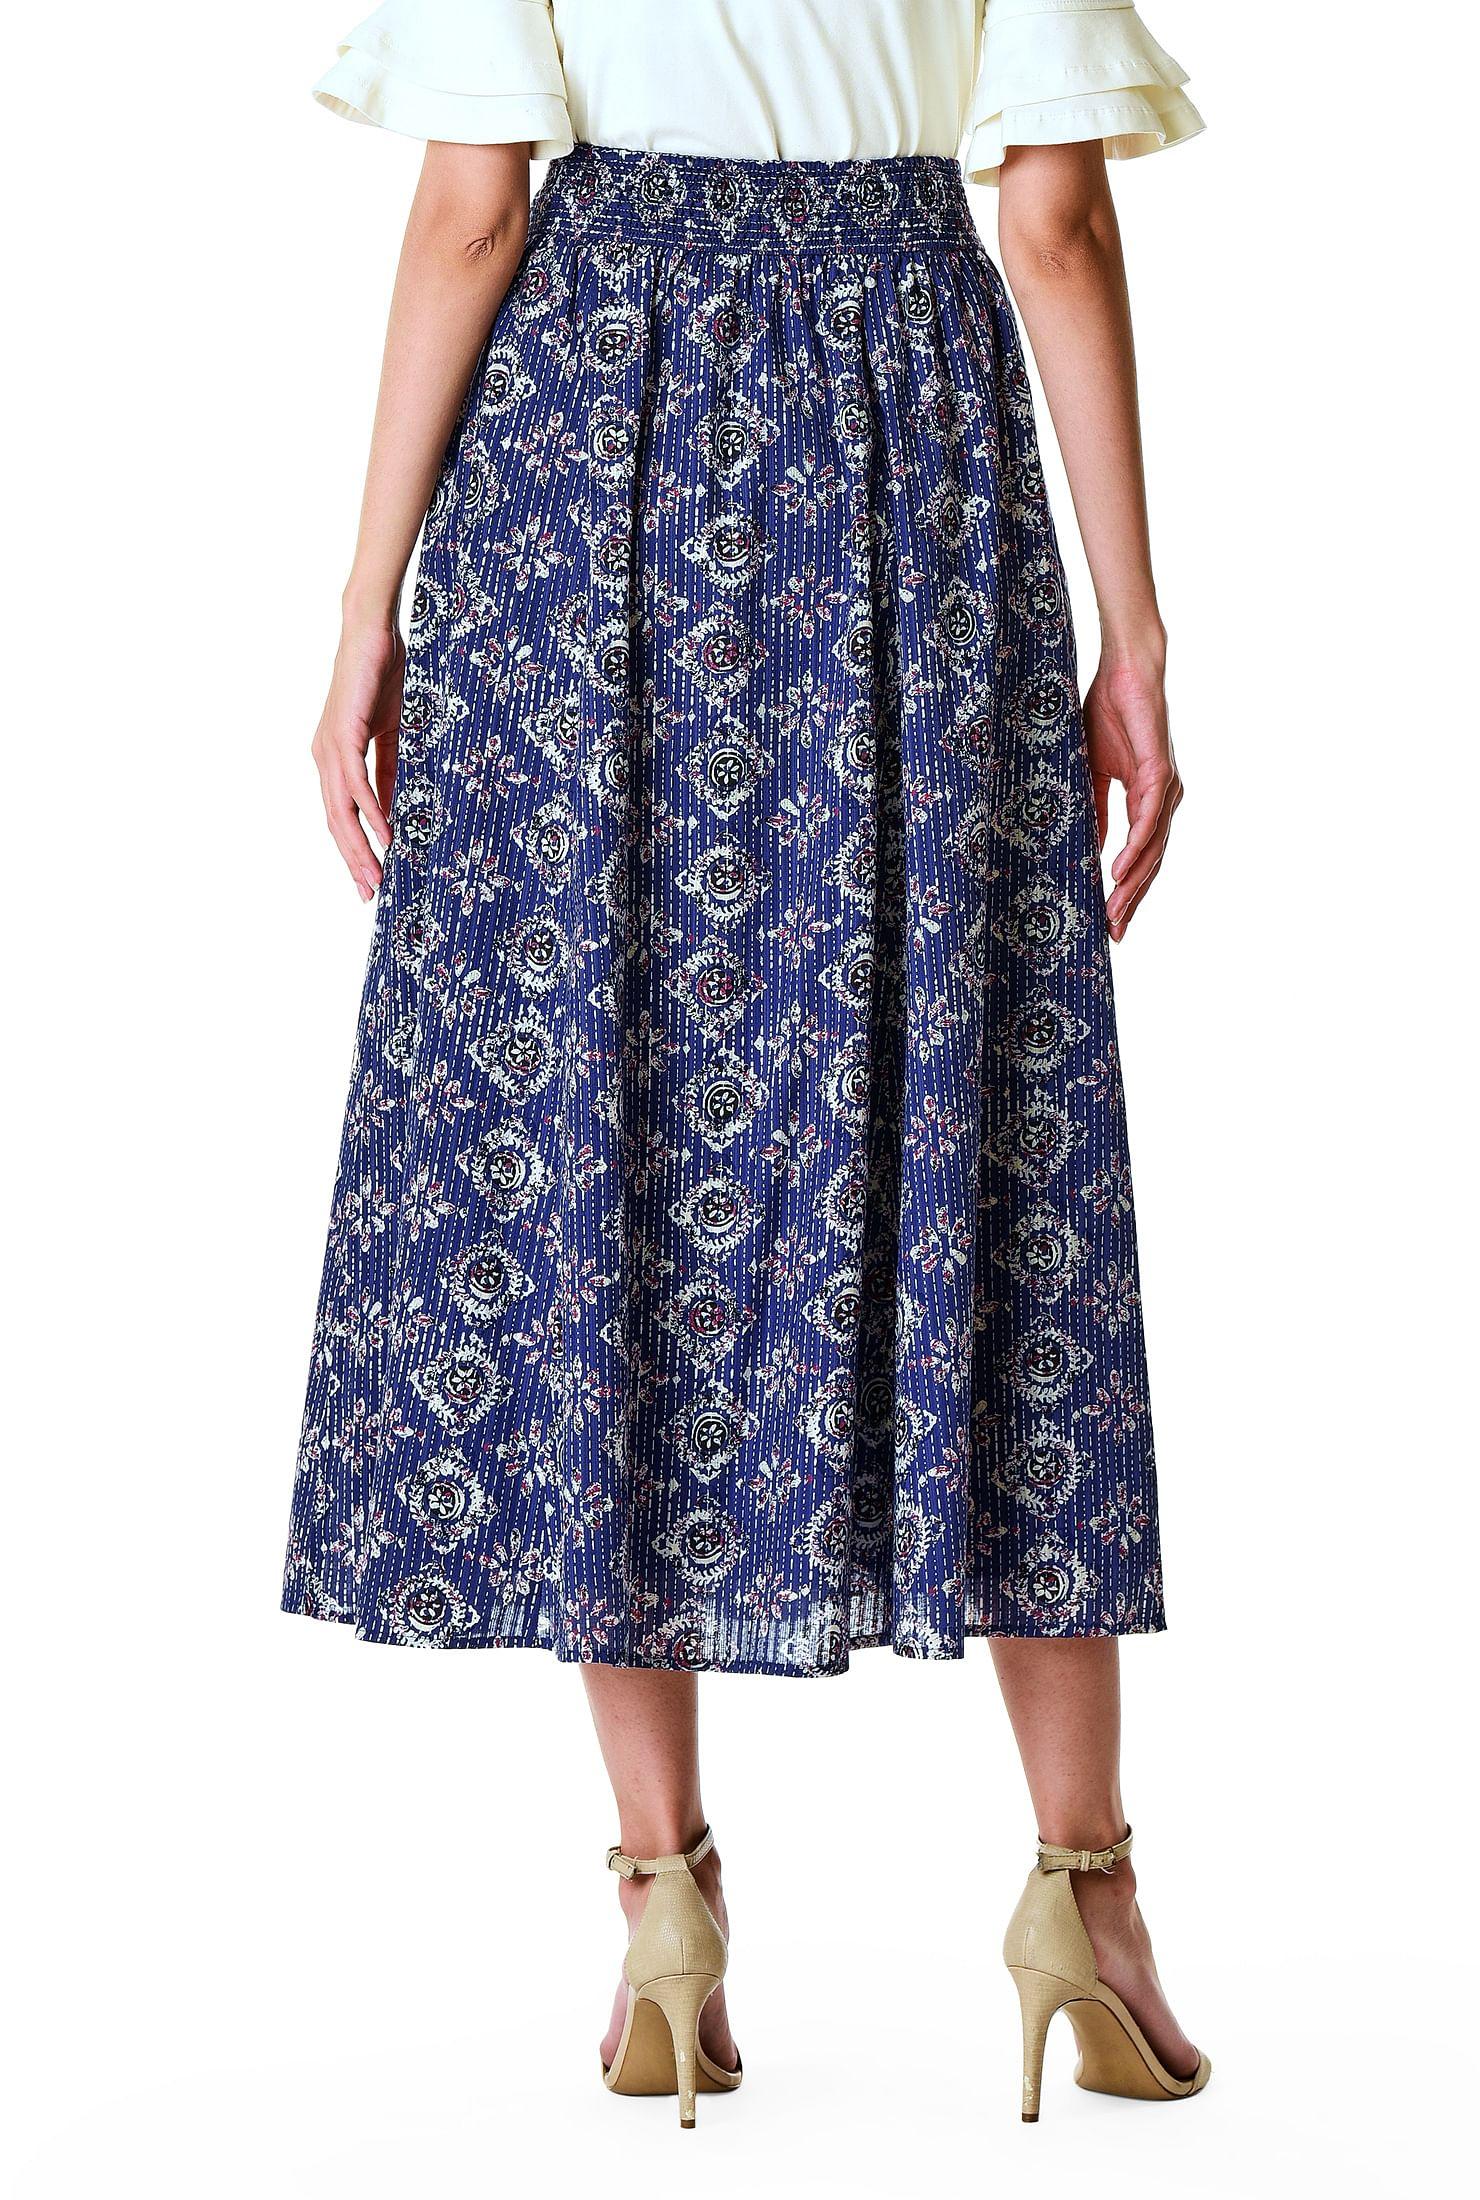 High Elastic Waist Mosaic Style Mid Calf Length Skirt For Womens Pleated Designs